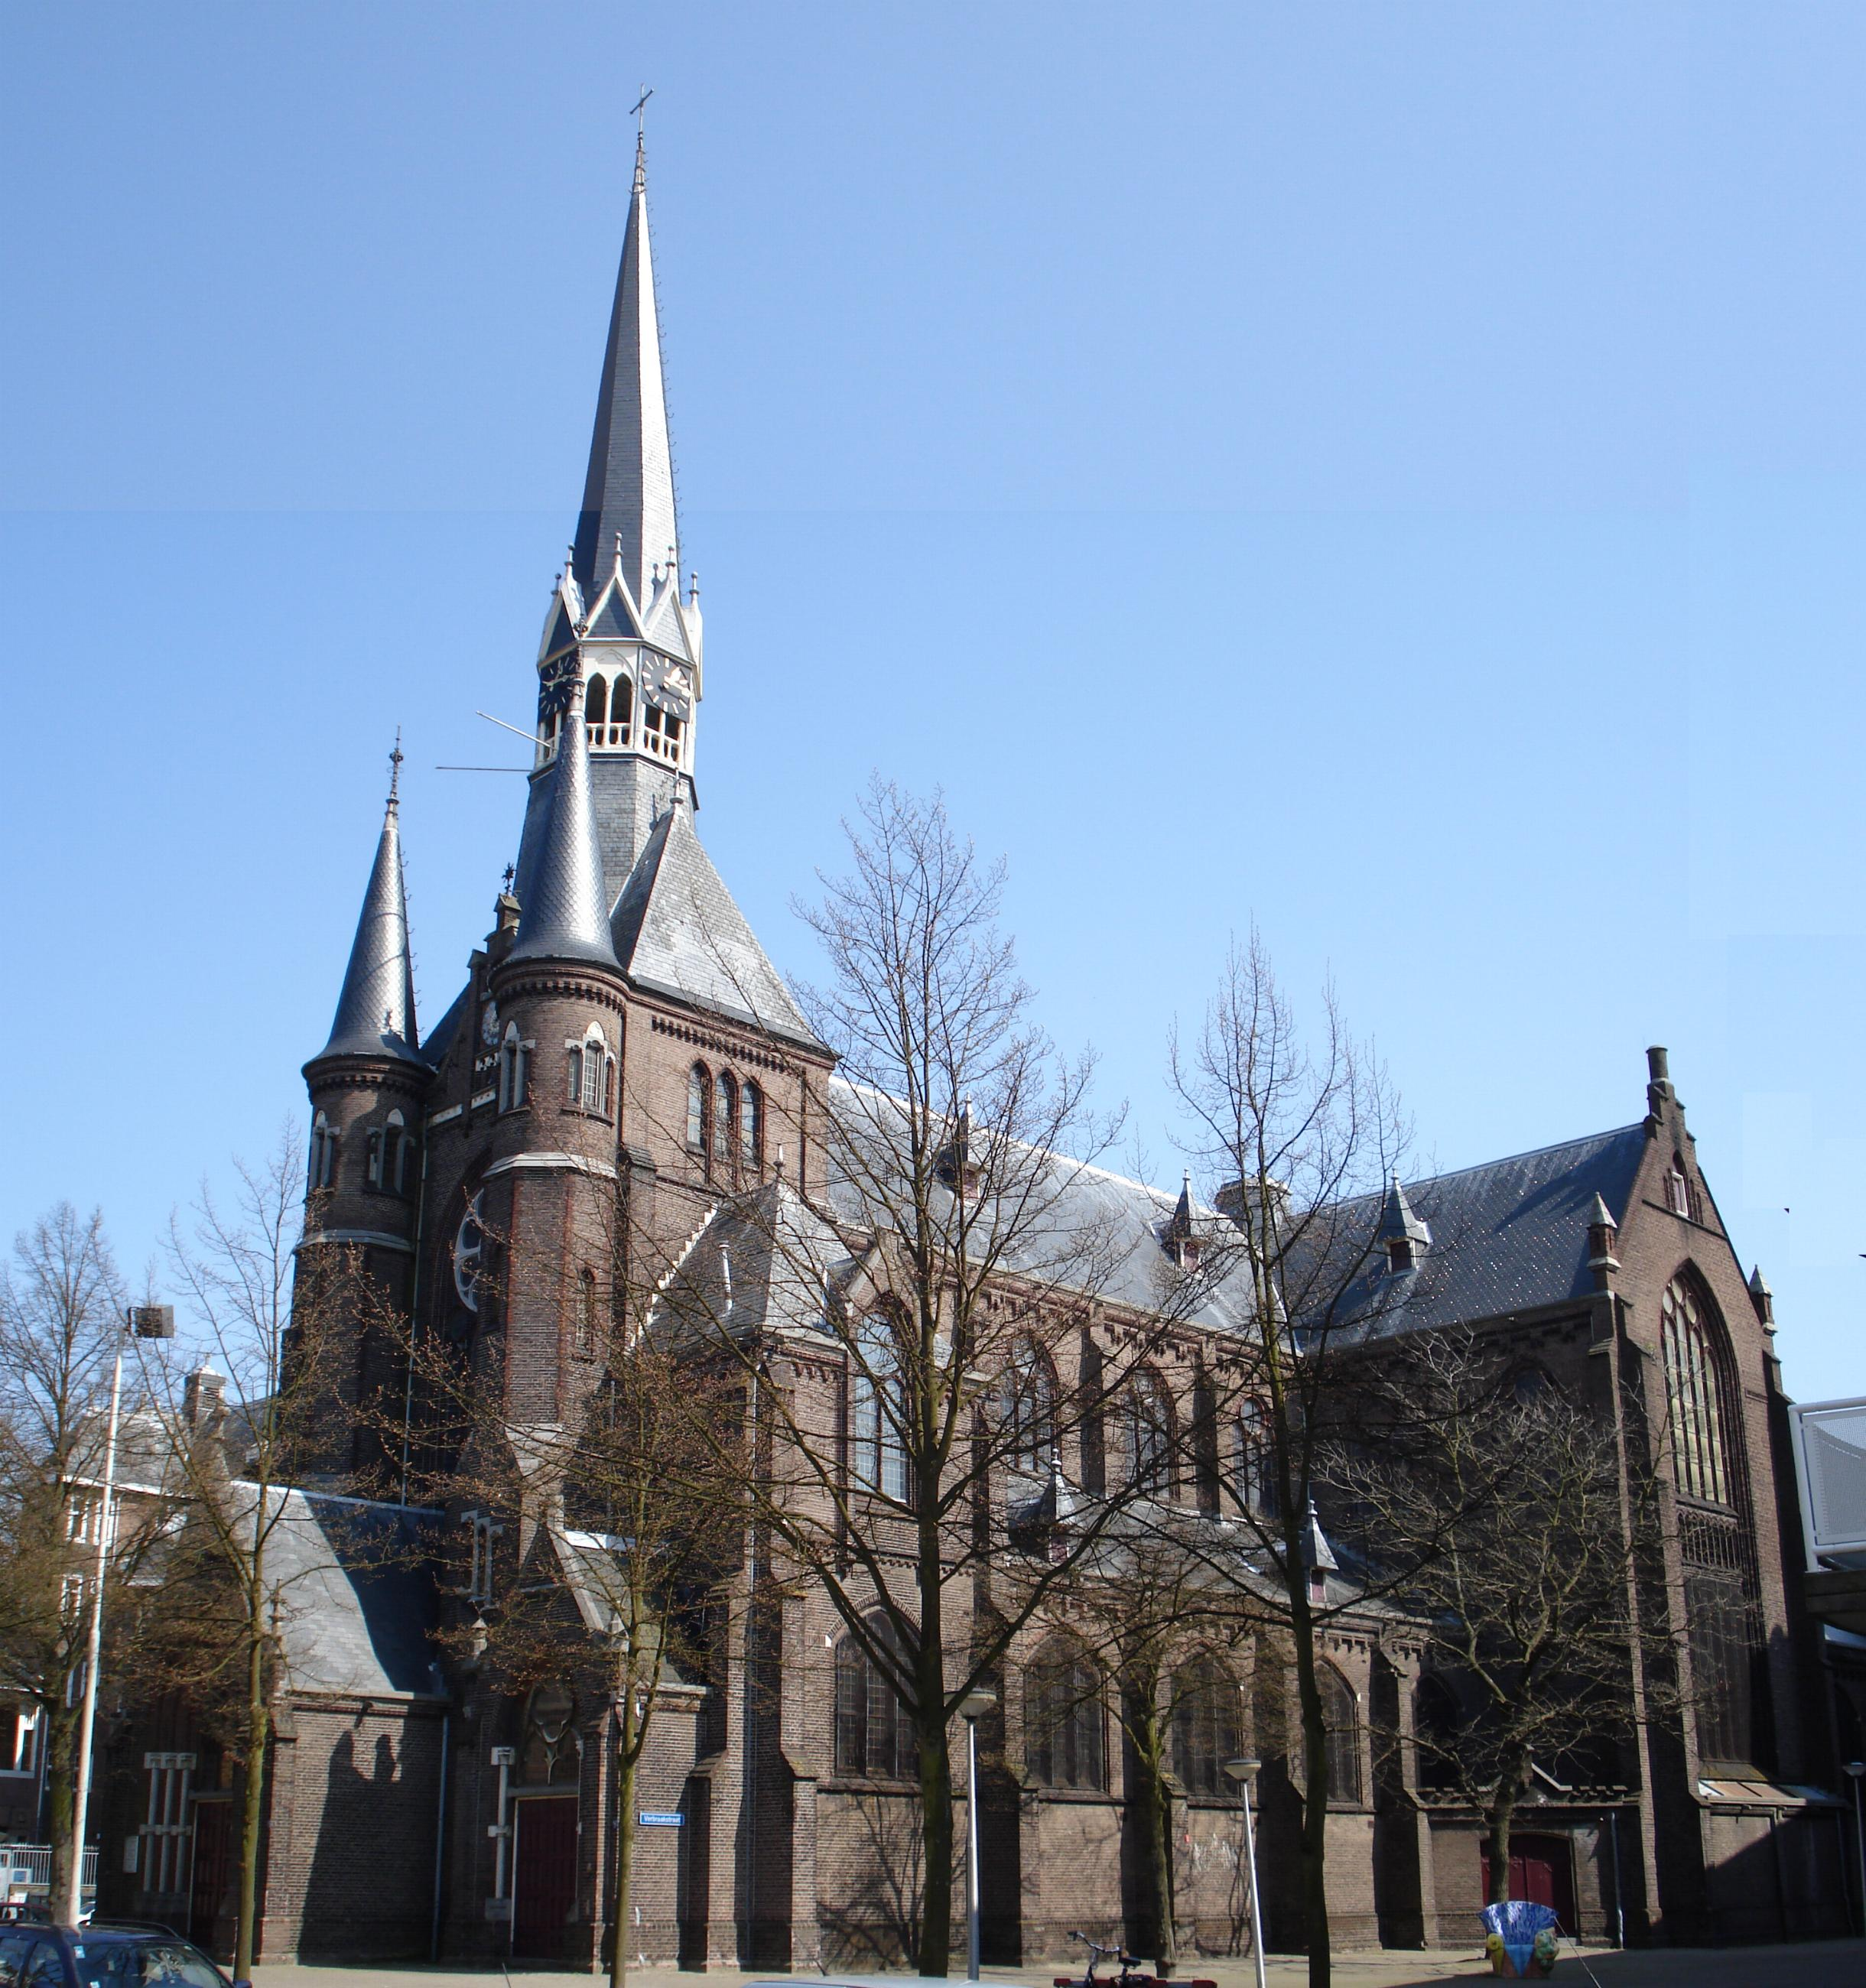 Sint-Hildegardis en Antoniuskerk - Wikipedia